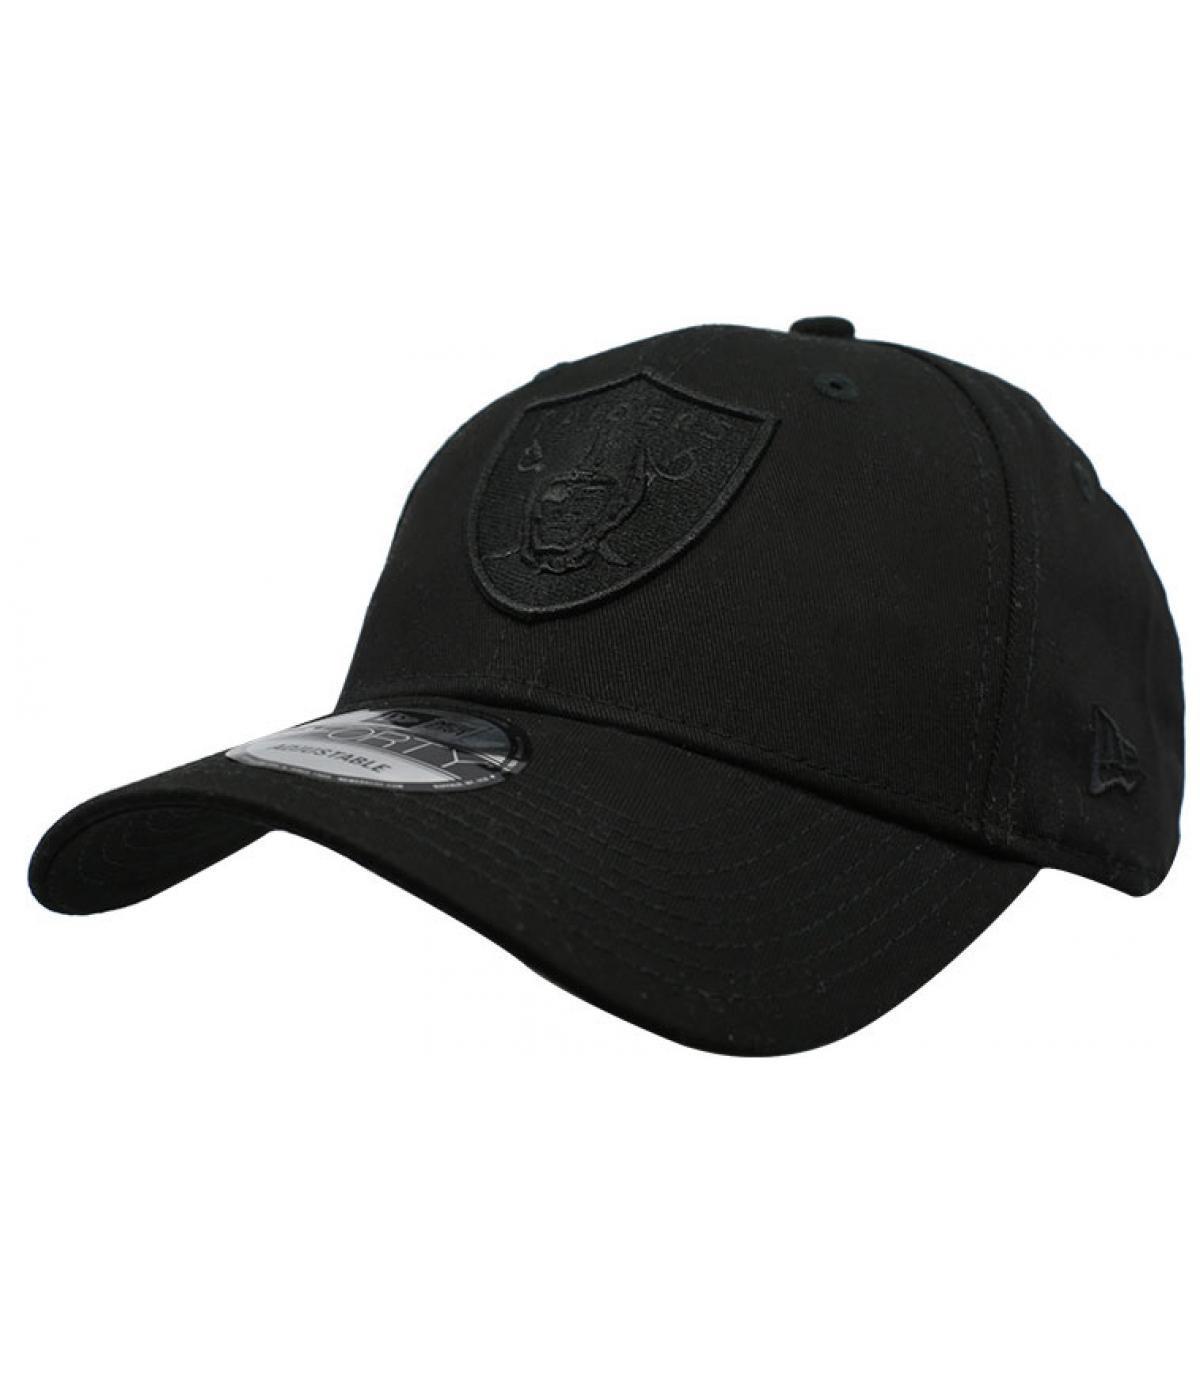 Details Cap 9Forty Raiders Snapback black - Abbildung 2